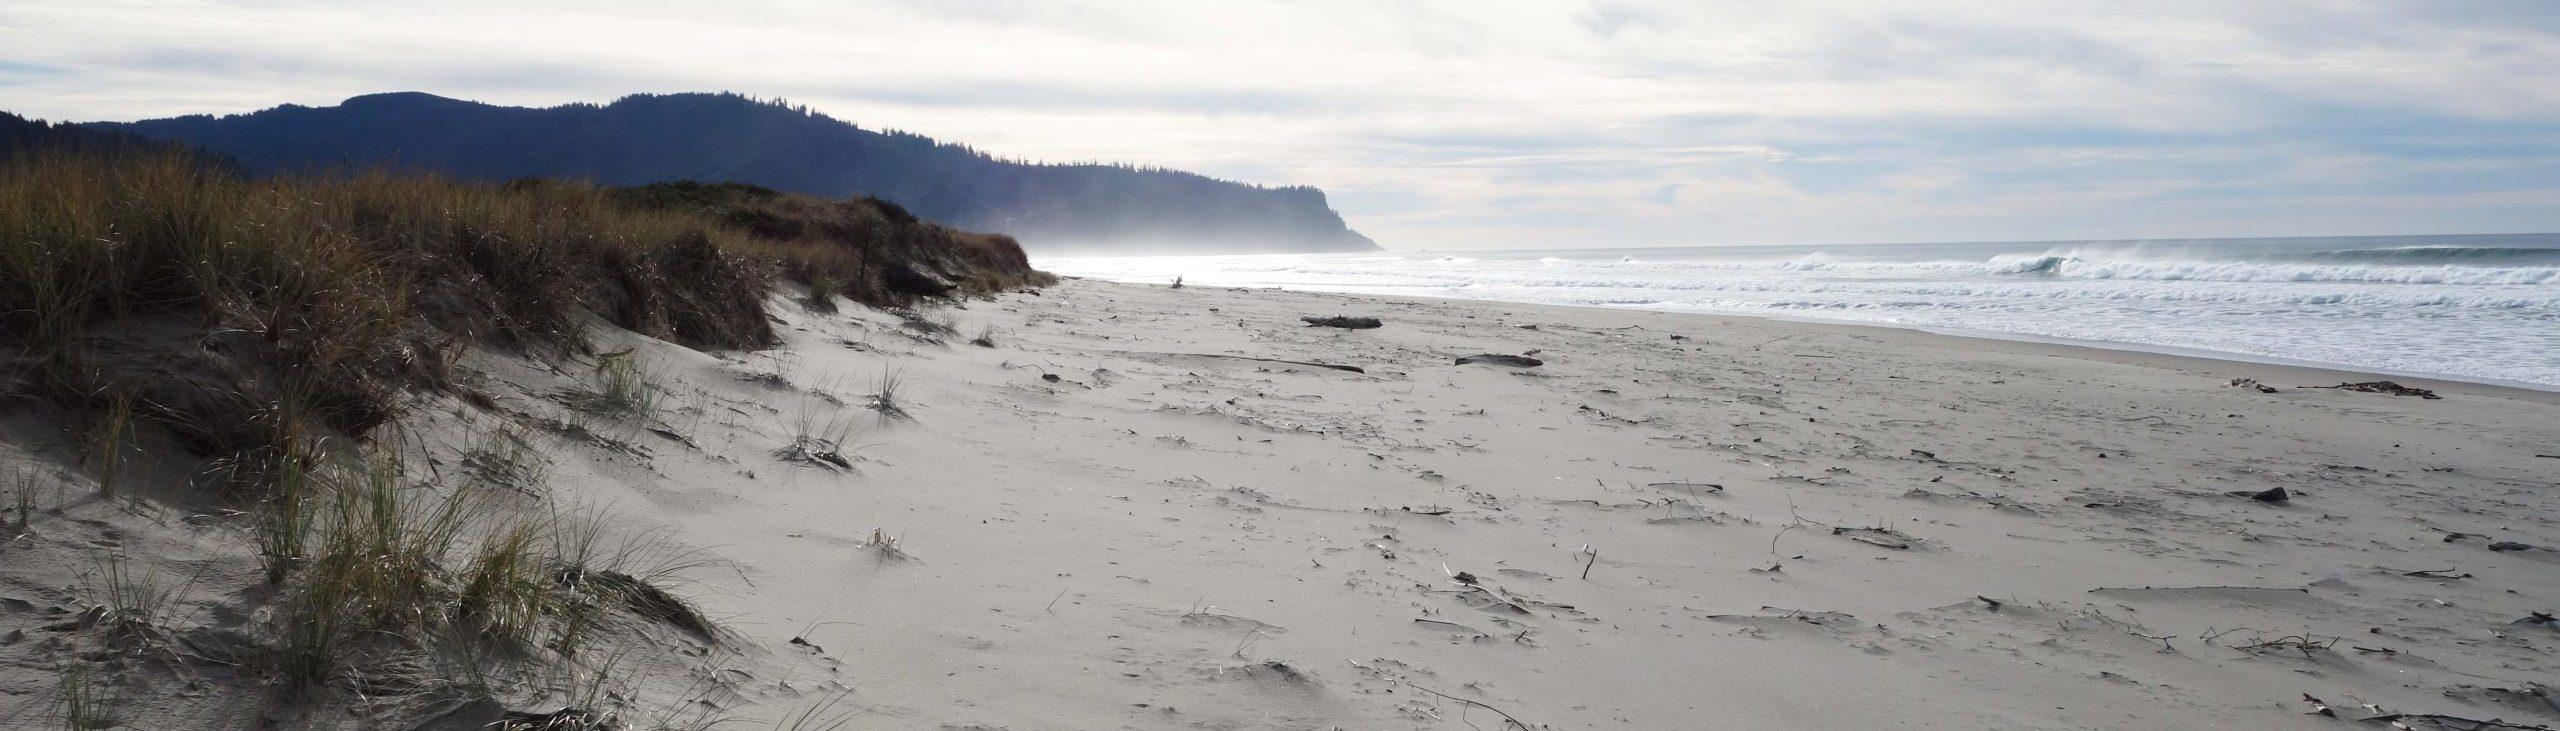 Private Beach Access on the Oregon Coast